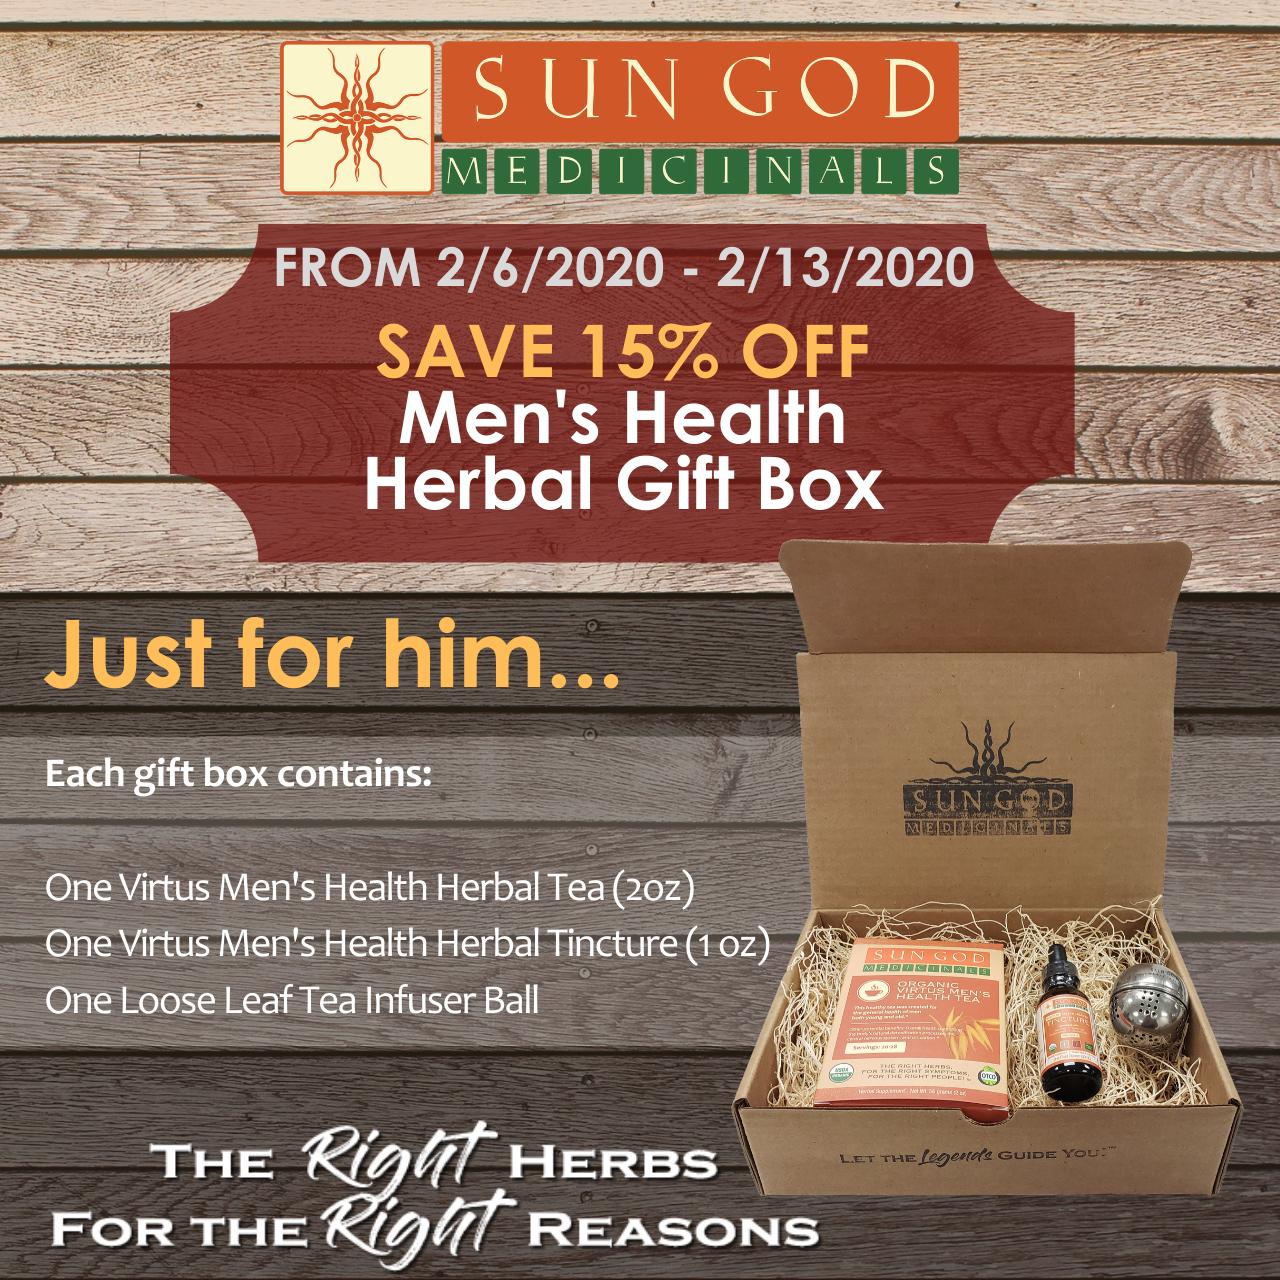 Men's Health Gift Box in 2020 Health gifts, Herbalism